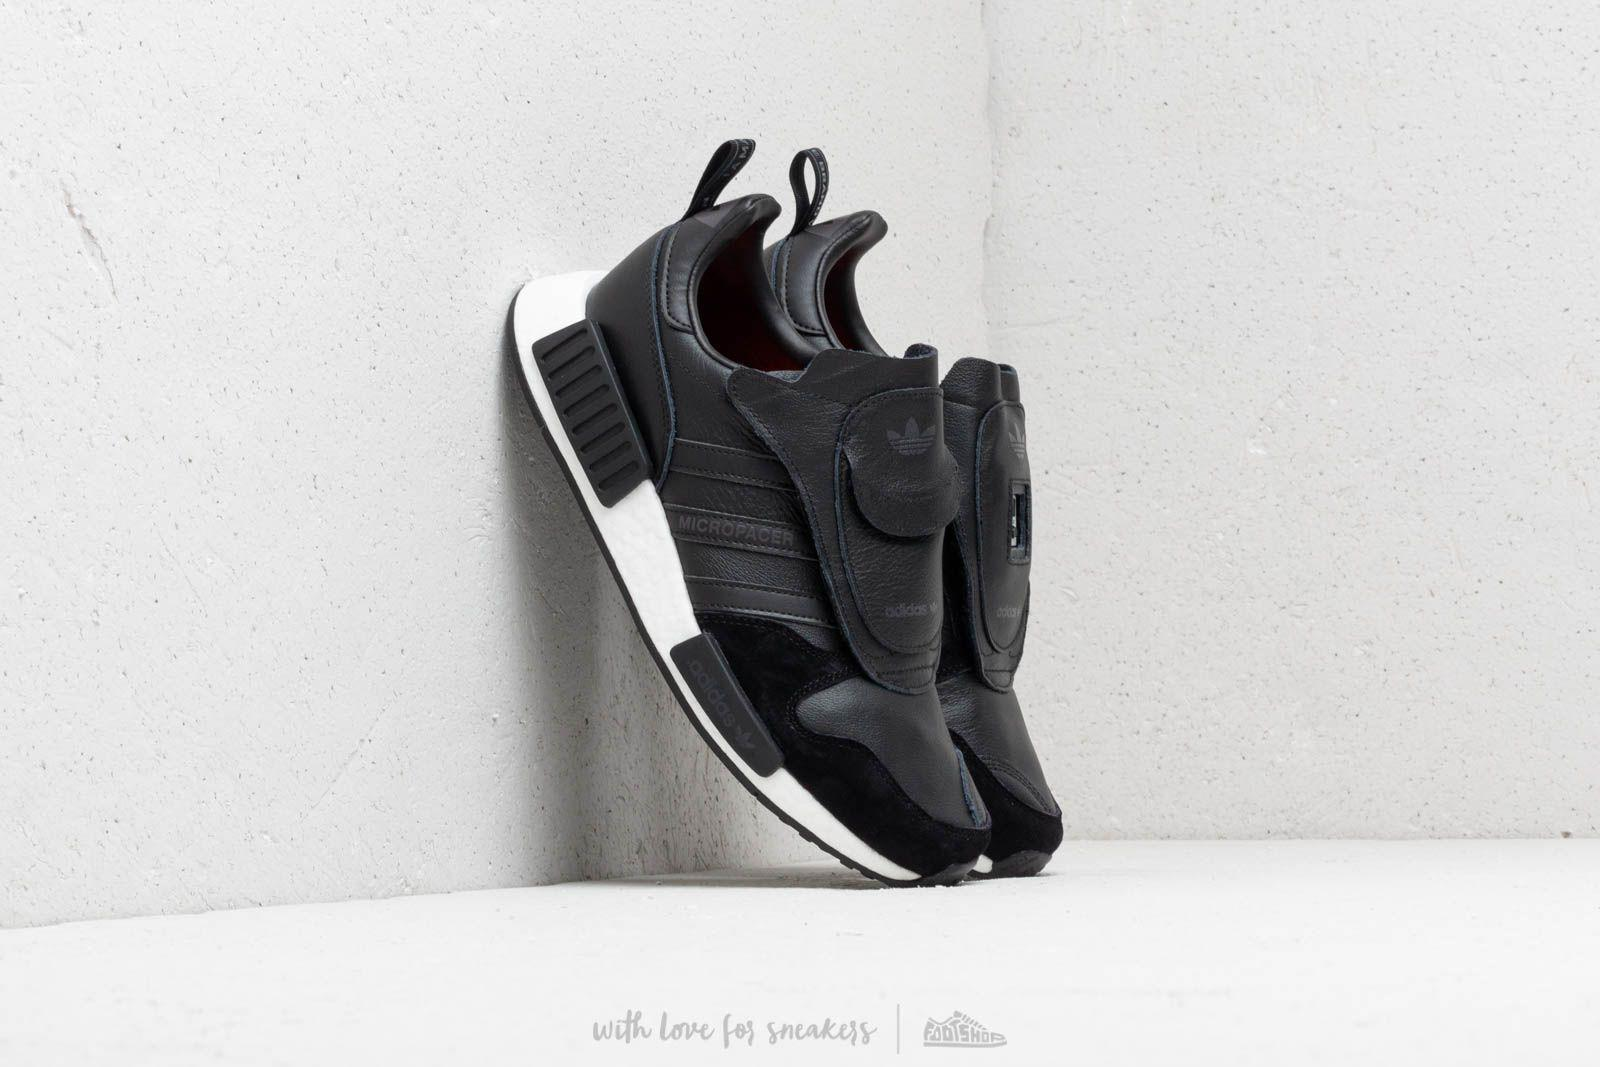 deae5683778 Lyst - adidas Originals Adidas Micropacer X R1 Core Black  Utility ...